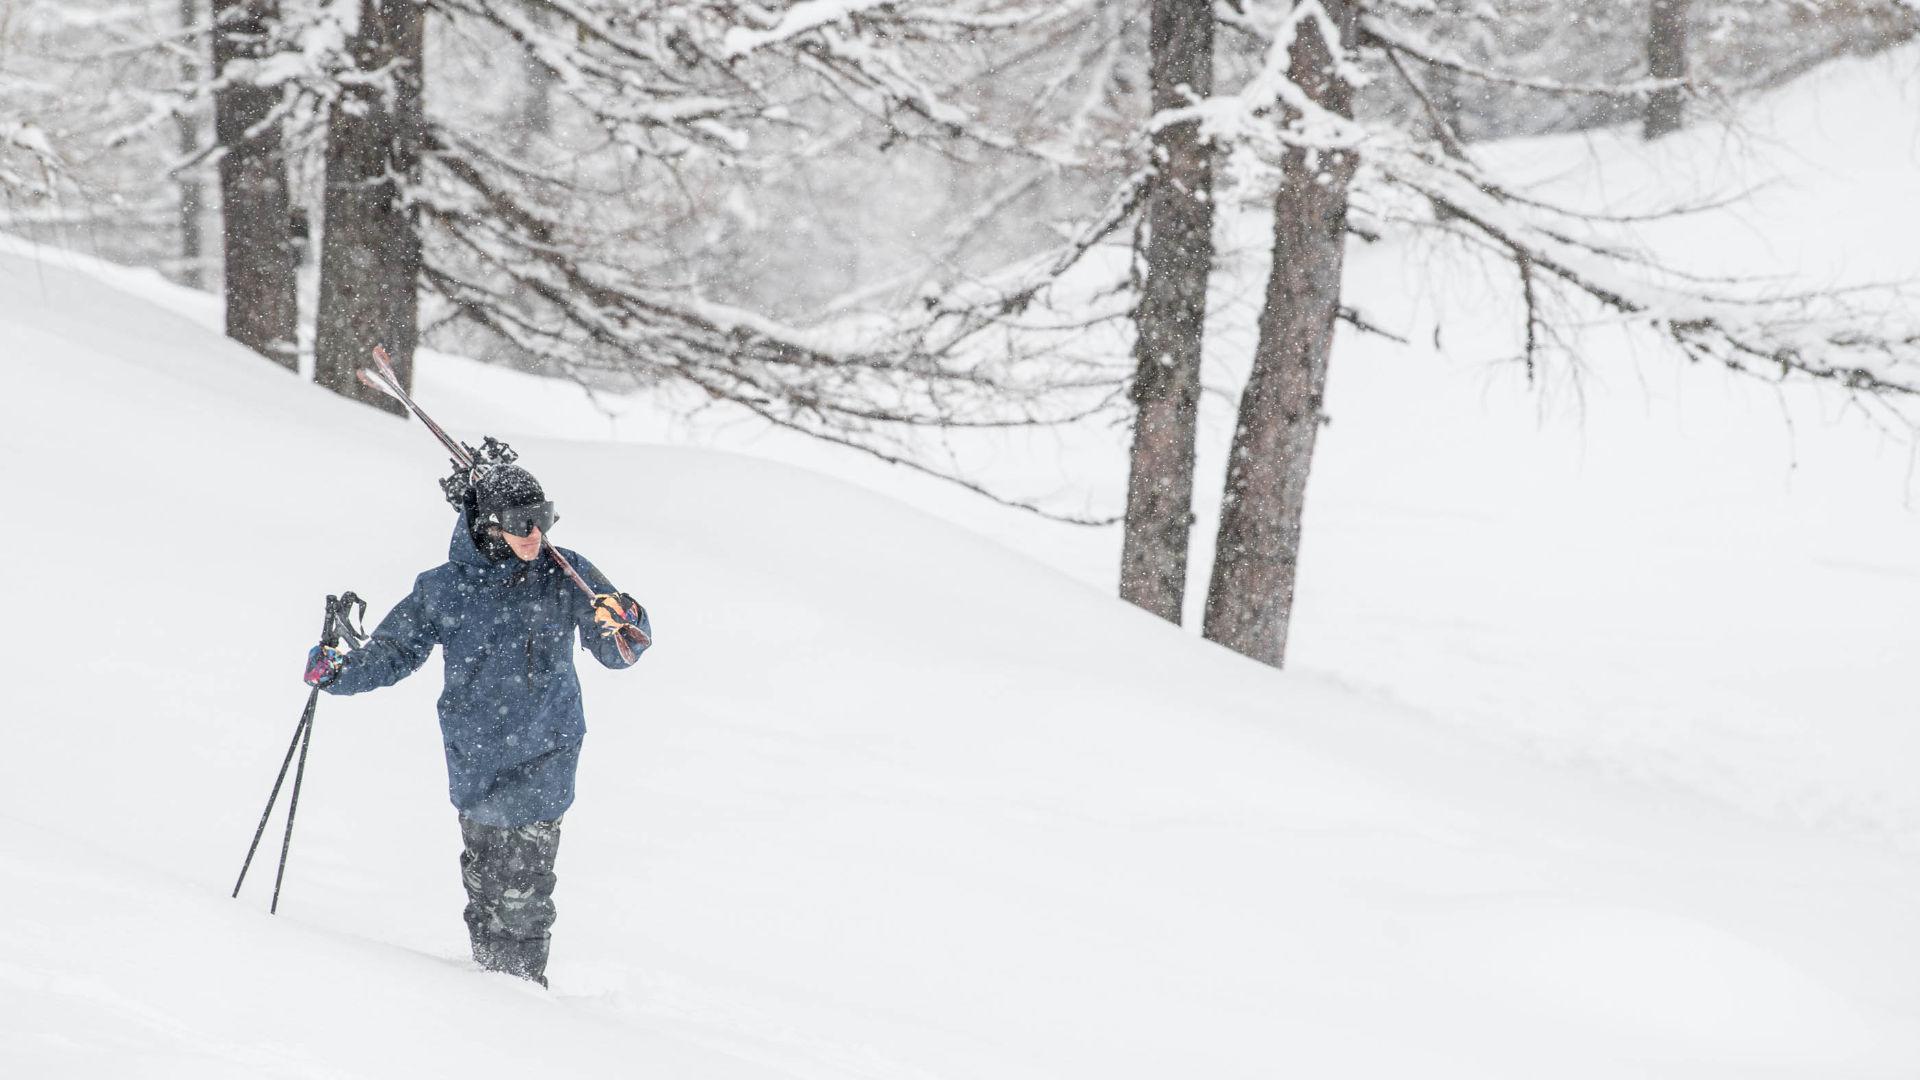 Freeskier hiking in heavy snowfall